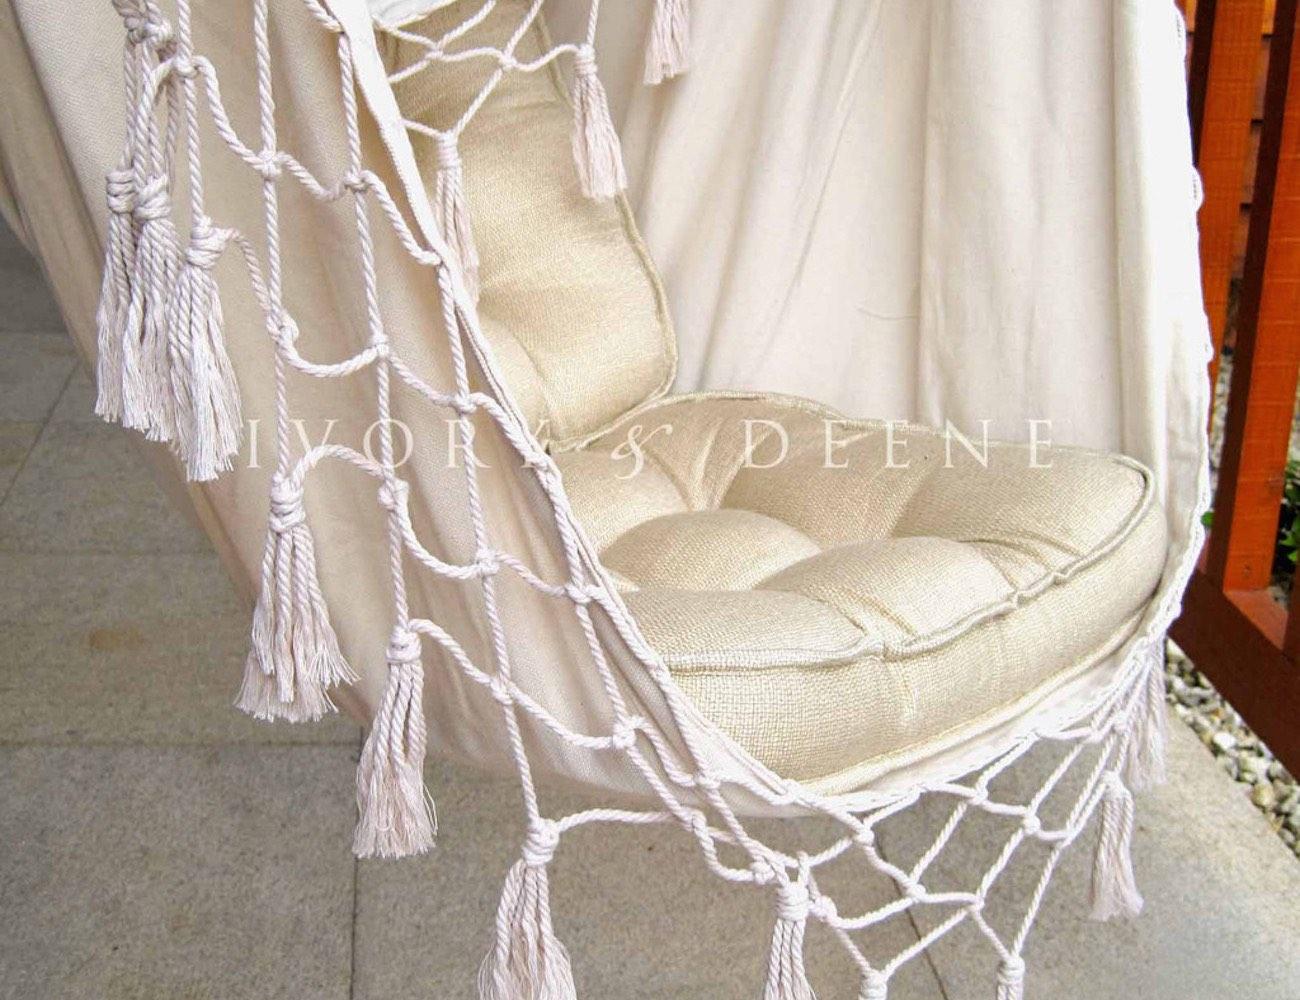 Luxury Hanging Hammock Chair